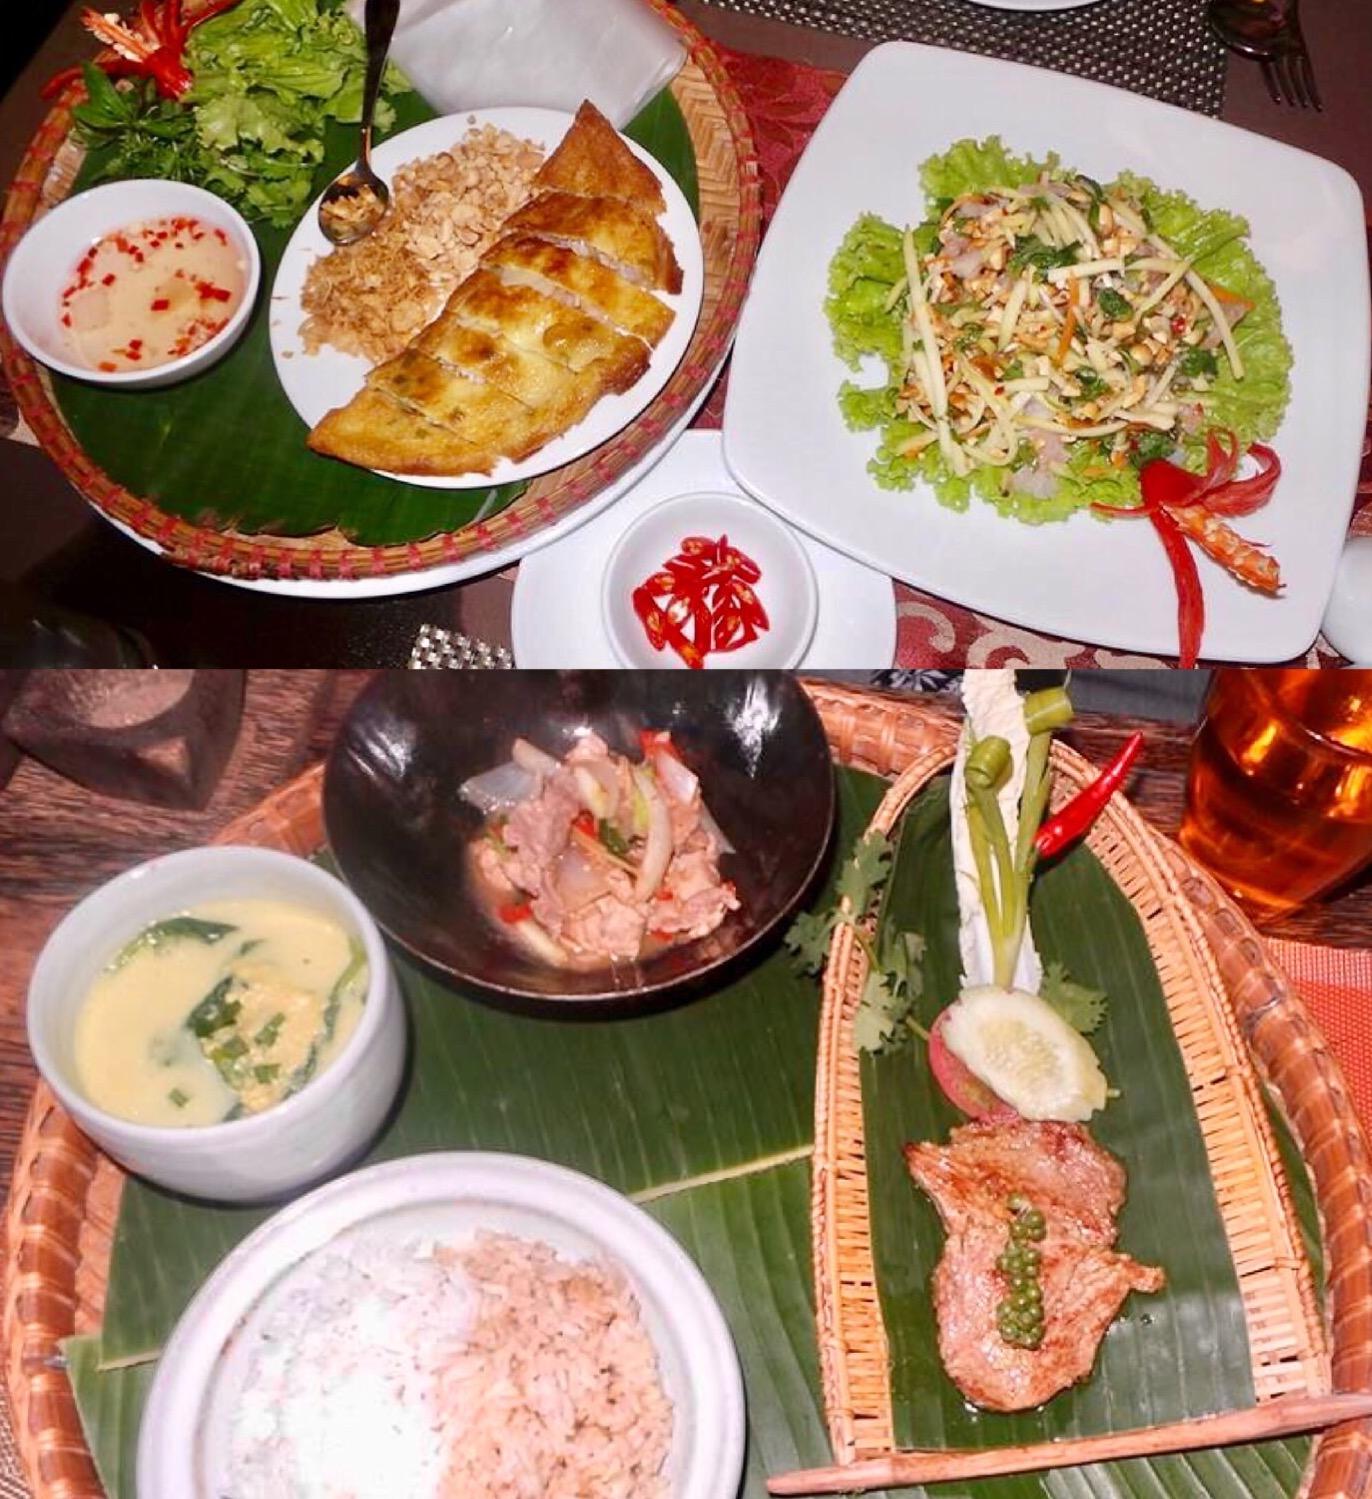 Delicious Vietnamese food at Essence, Hanoi